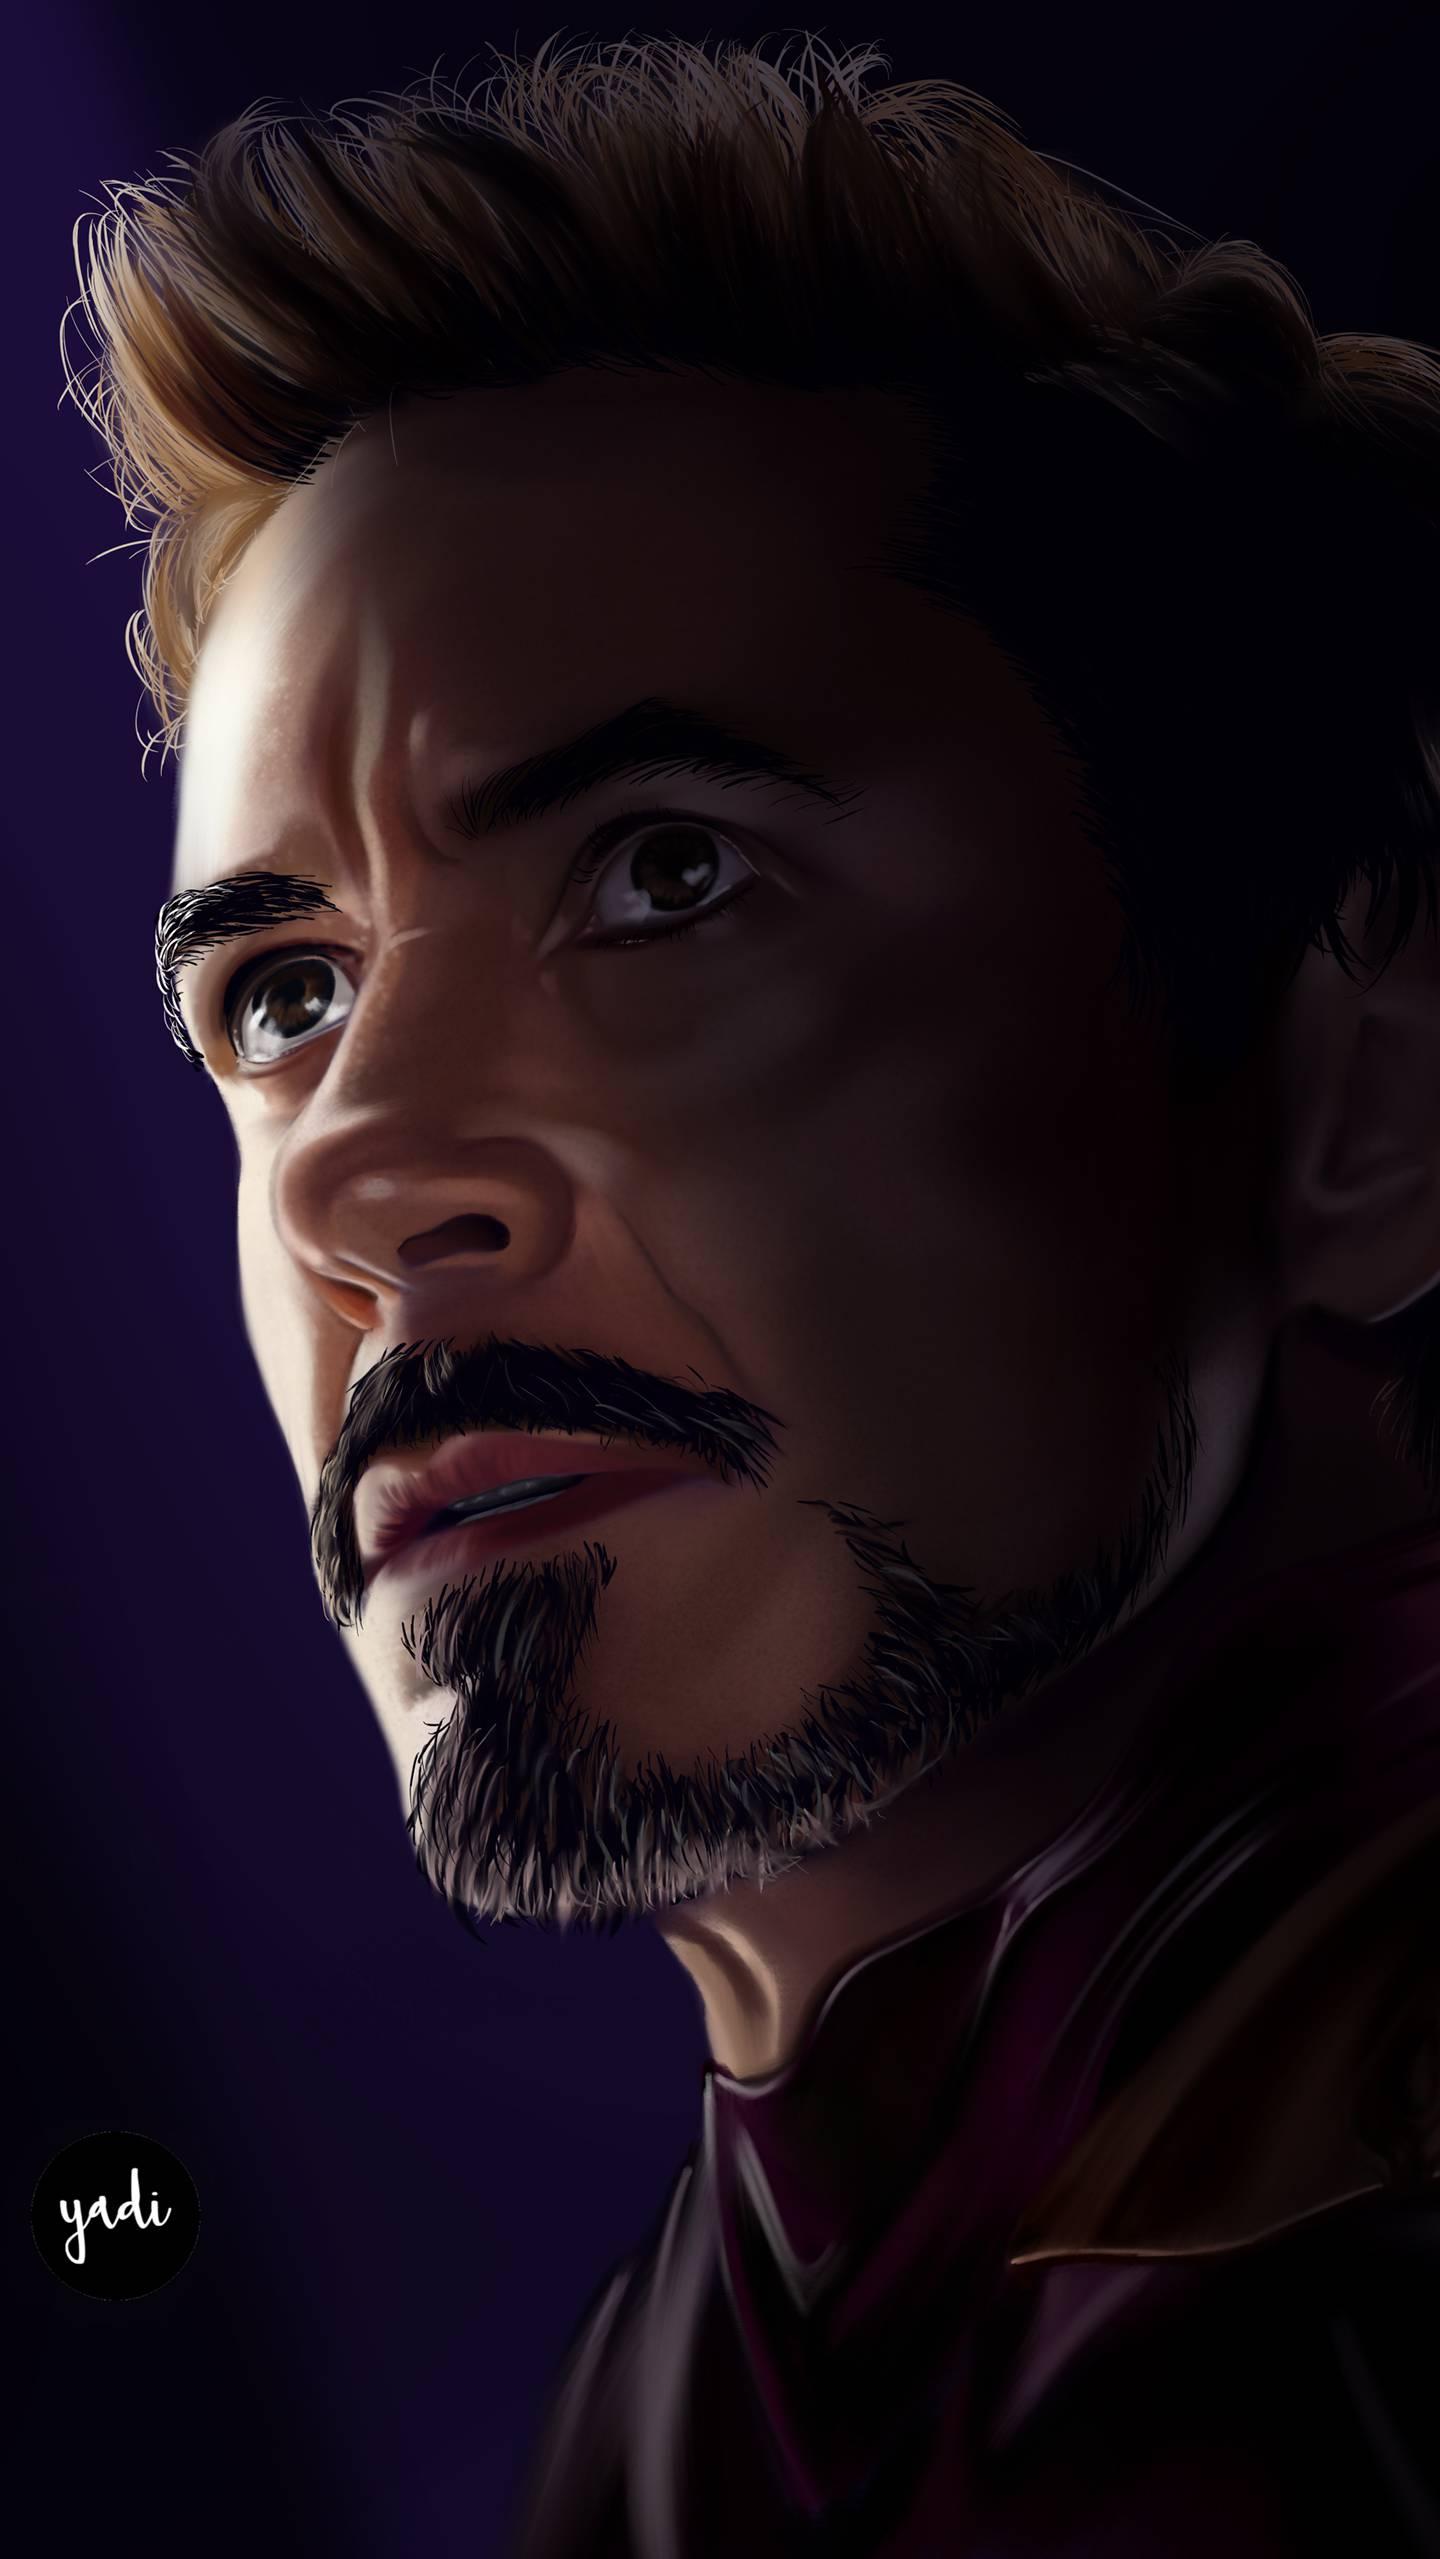 Tony Stark Portrait Art iPhone Wallpaper